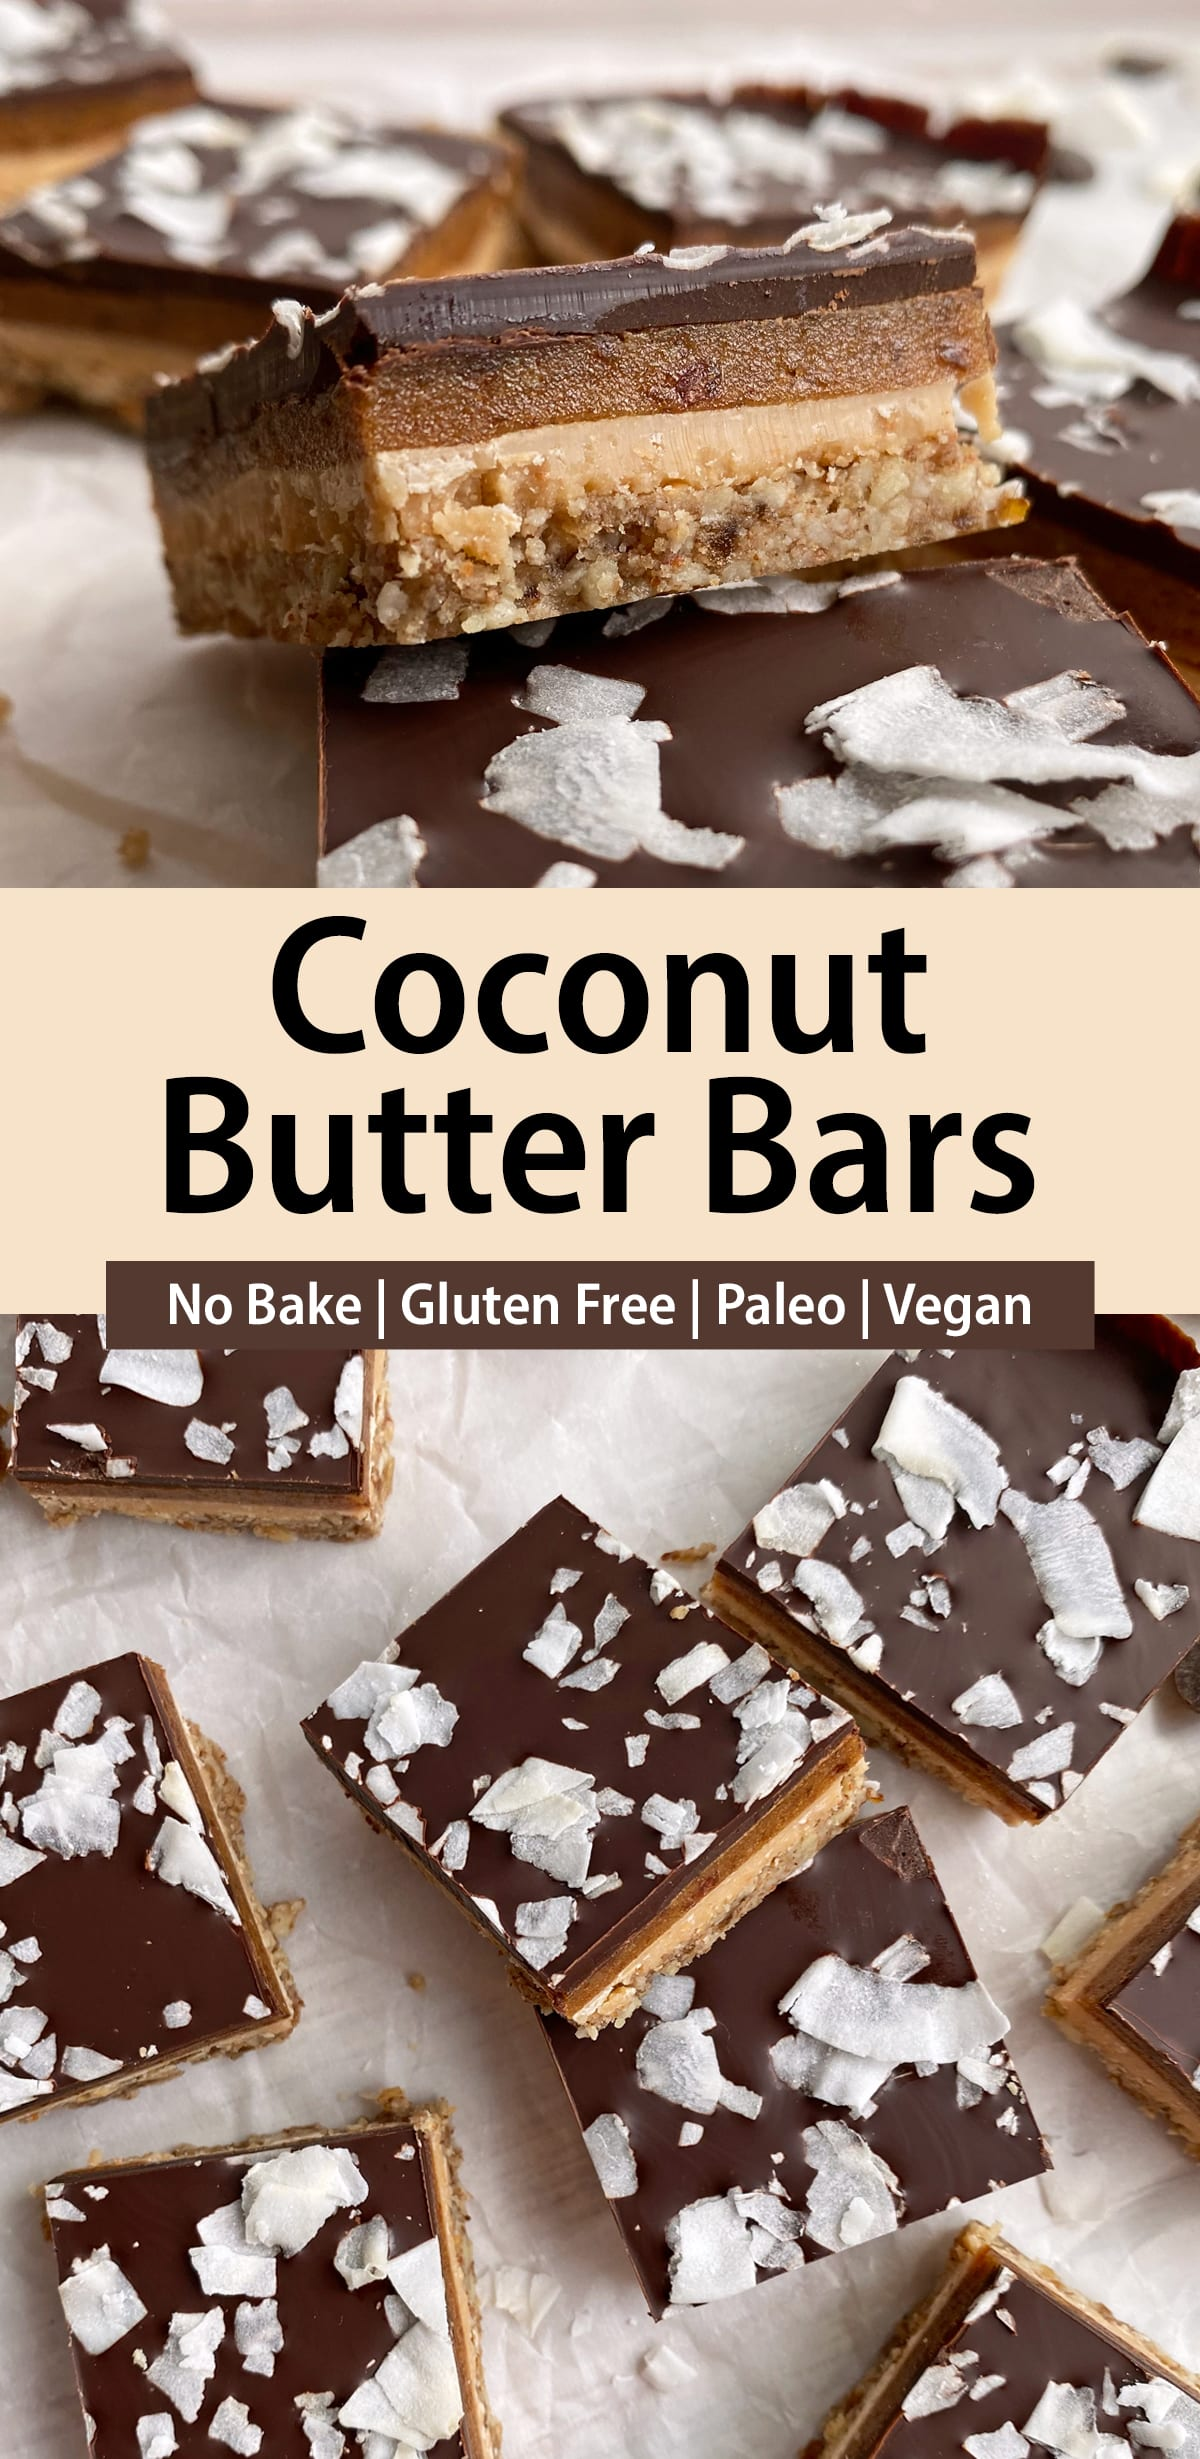 Coconut-Butter-Bars-Recipe-pinterest-image